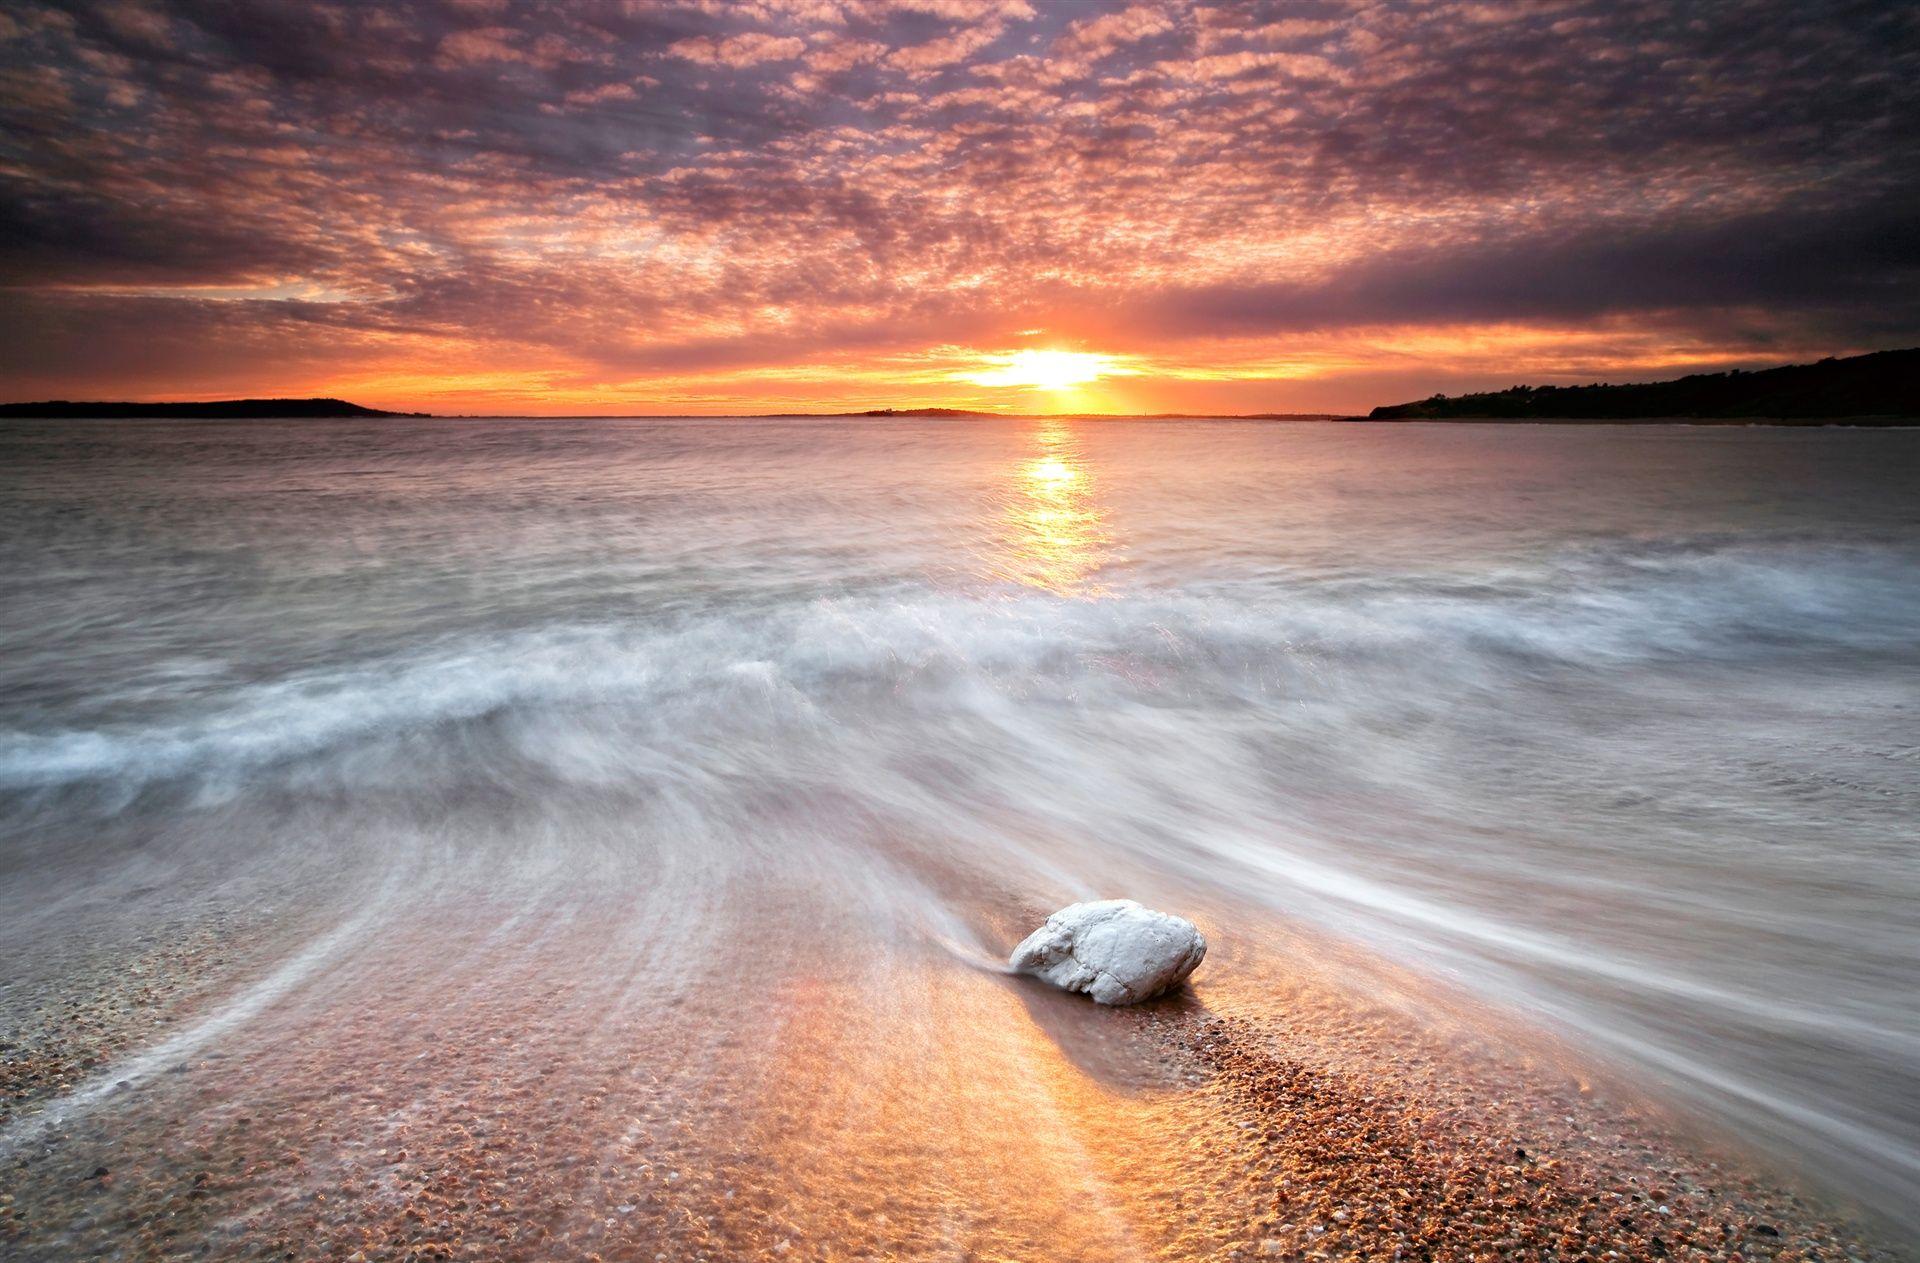 Lane Wave Exposure Sea Water Flows Stone Beach Sunset Rocks Sun Light Sky Sunset Nature Sunset Sunset Images Hd wallpaper clouds beach sea rocks